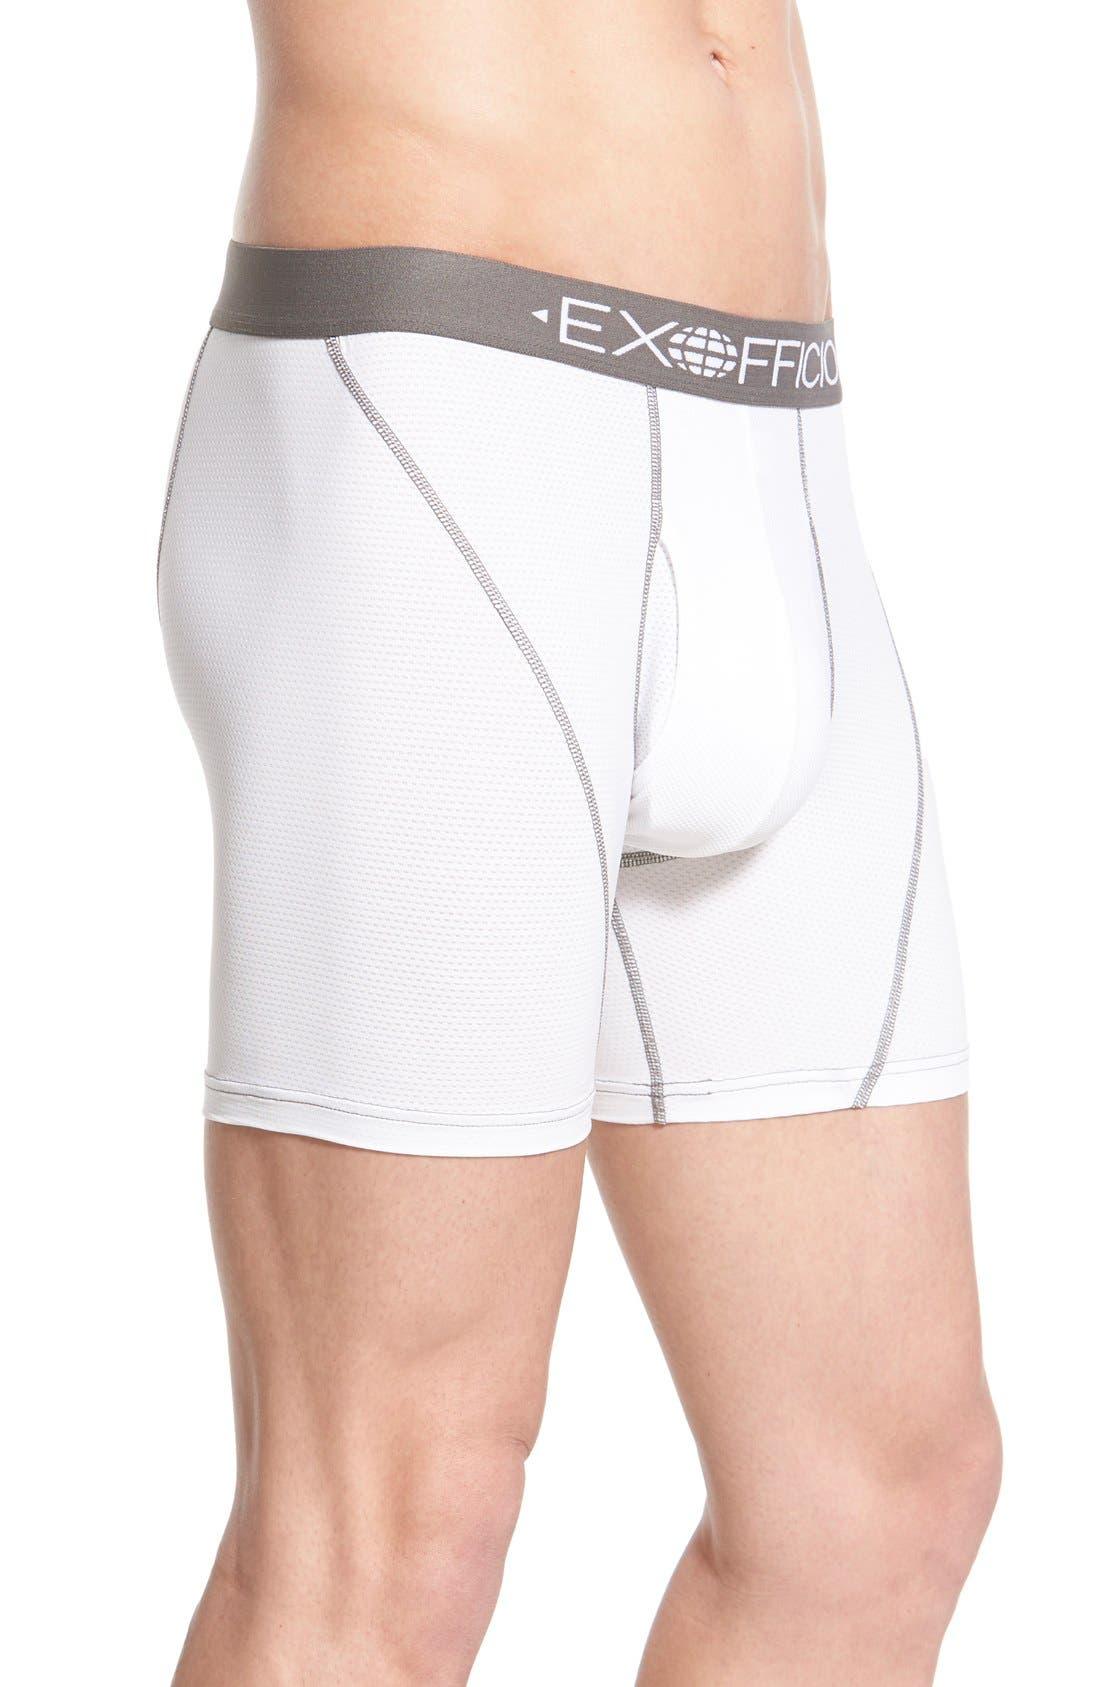 Alternate Image 3  - Ex Officio Give-N-Go Sport Mesh Boxer Briefs